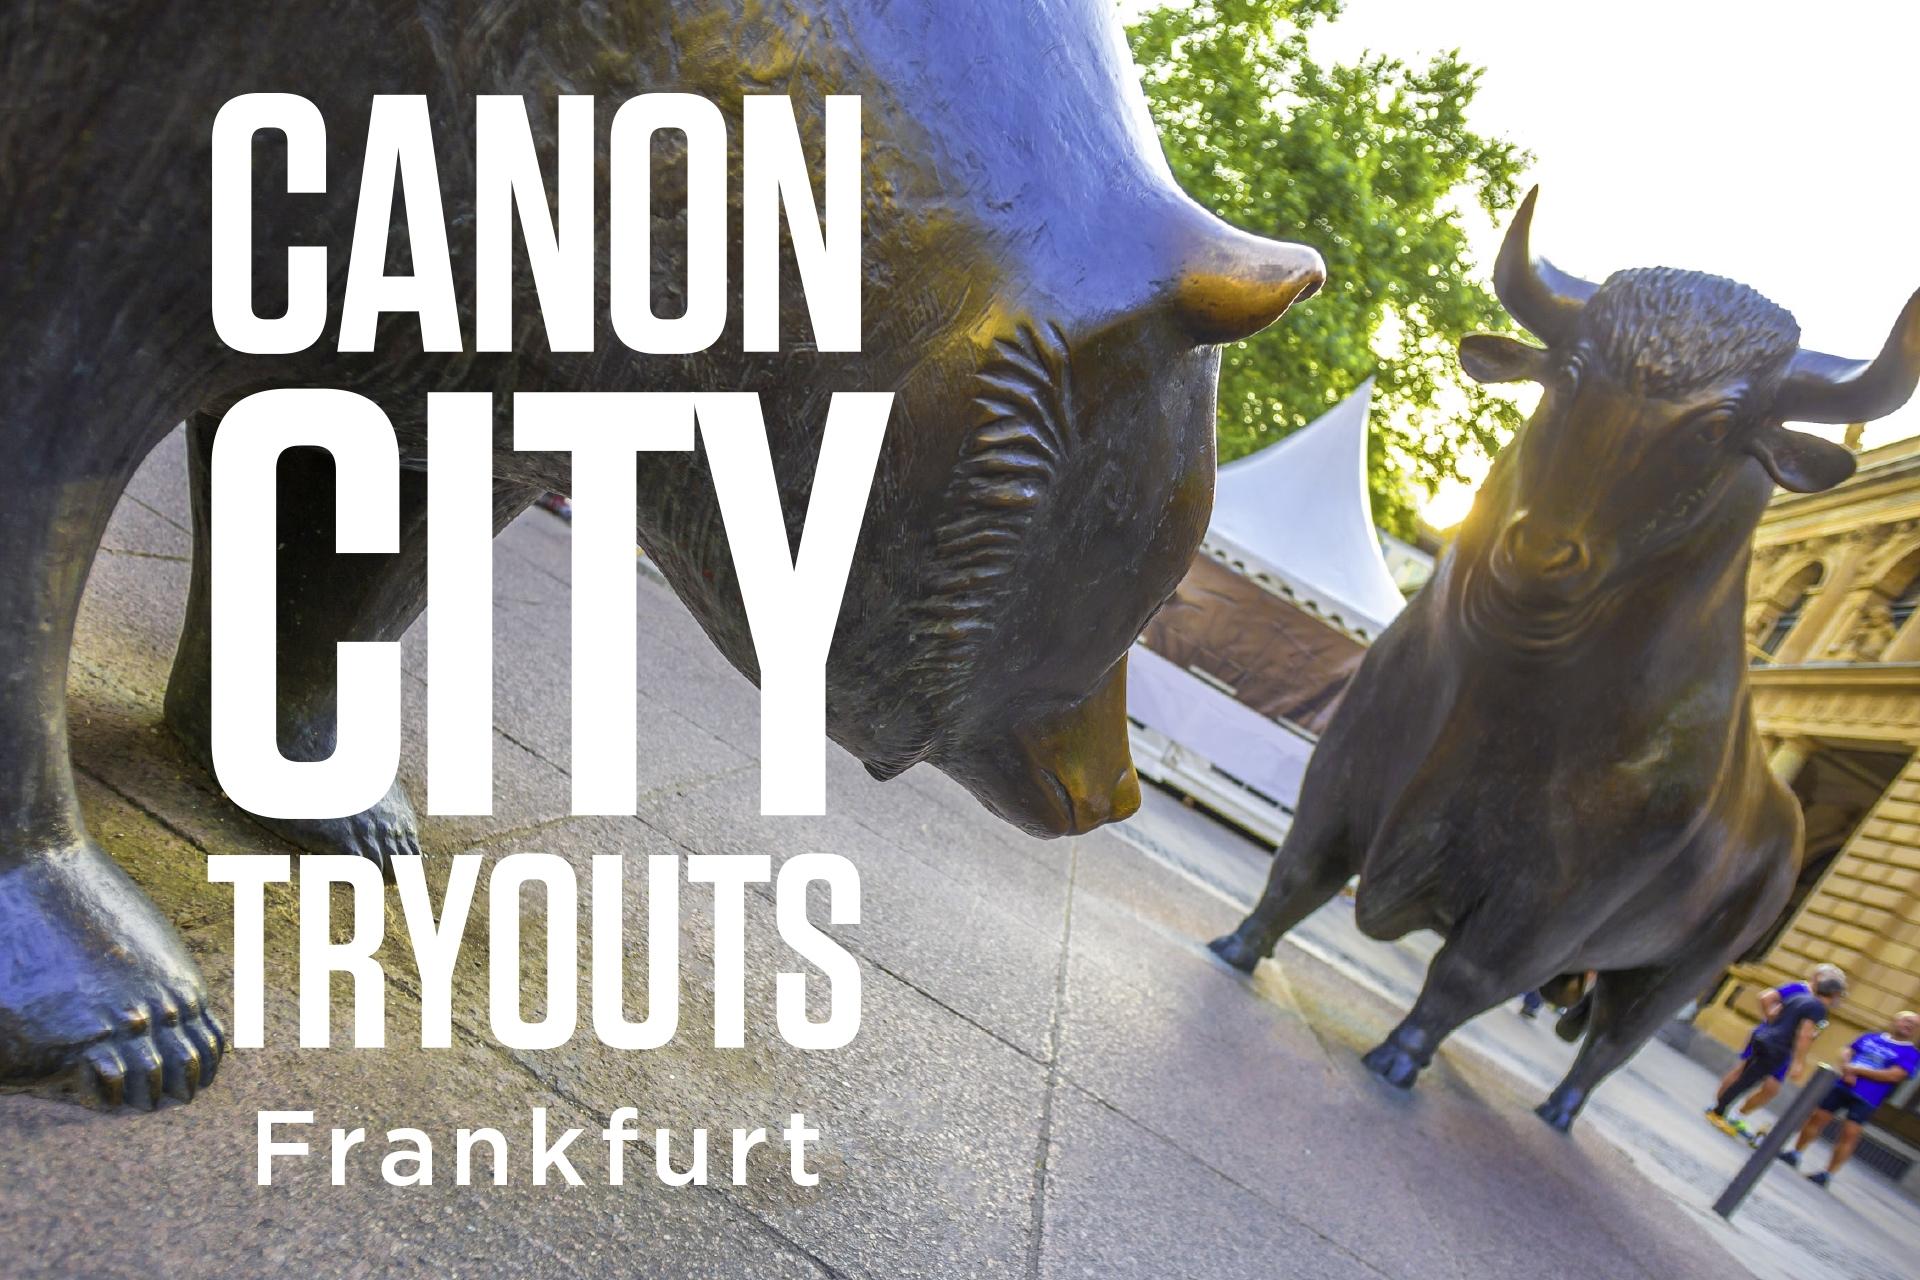 Canon City Tryout in Hamburg - Canon Academy Spezialthemen